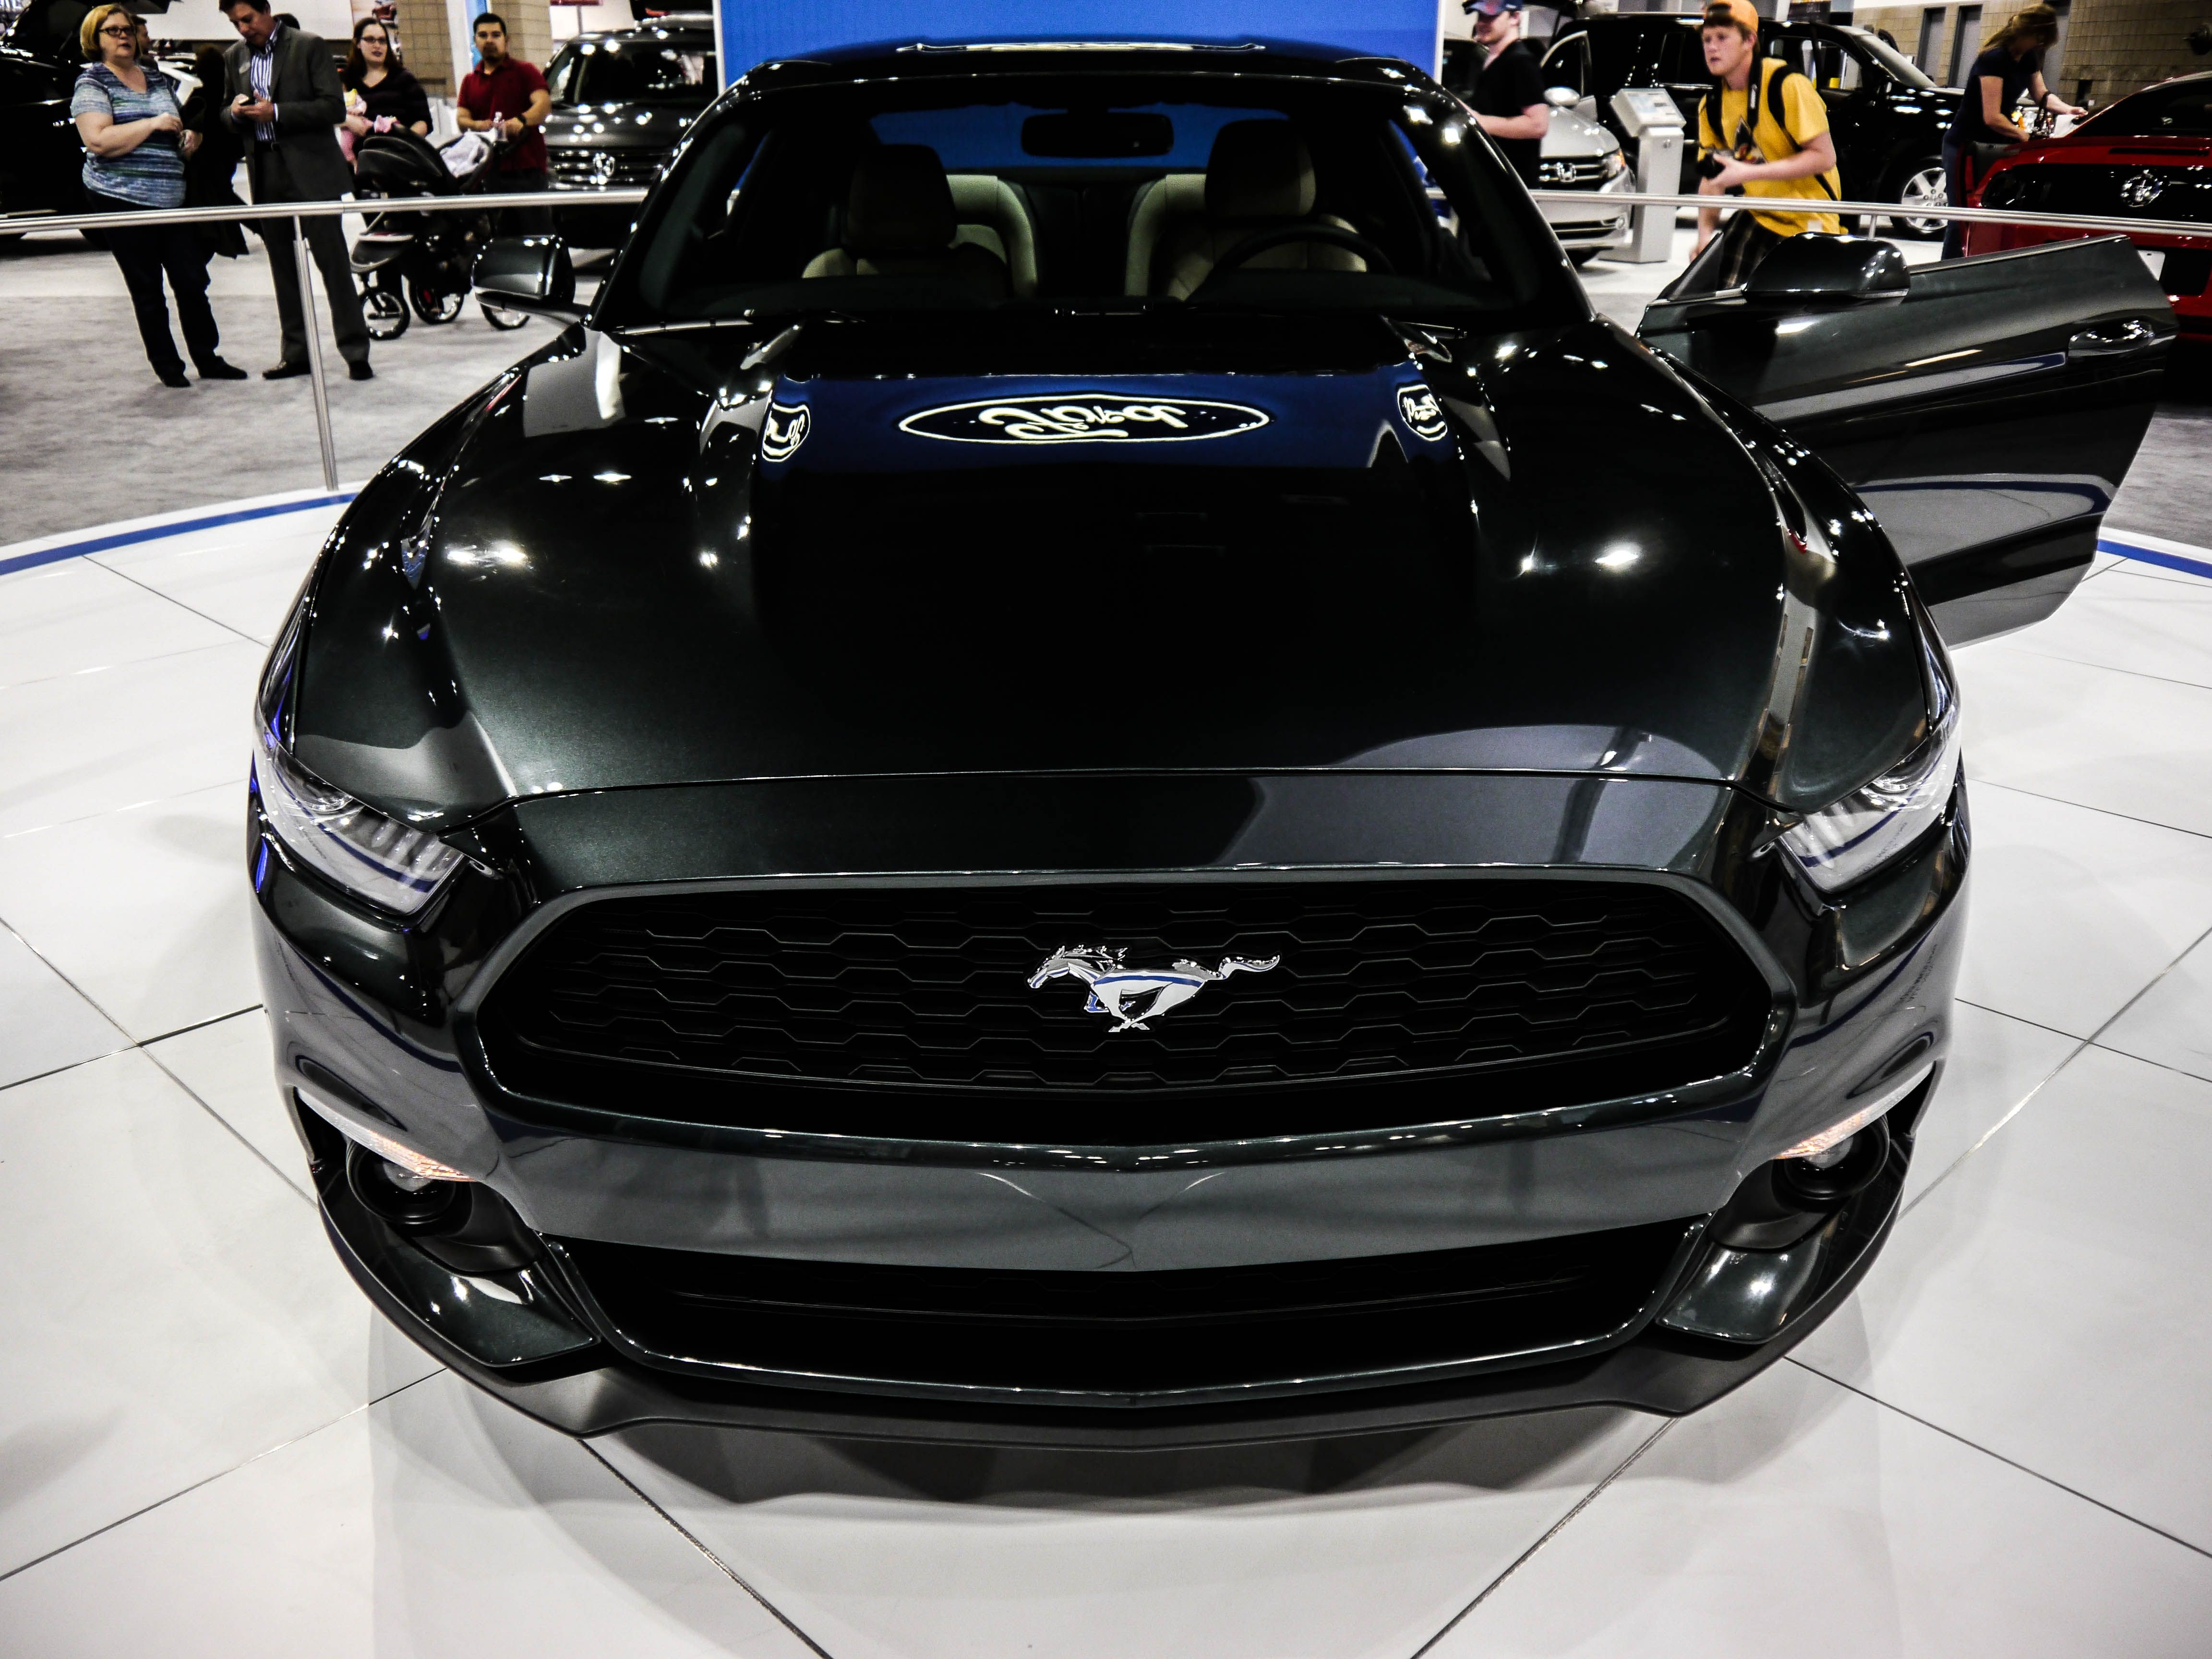 Black 2015 Ford Mustang junk